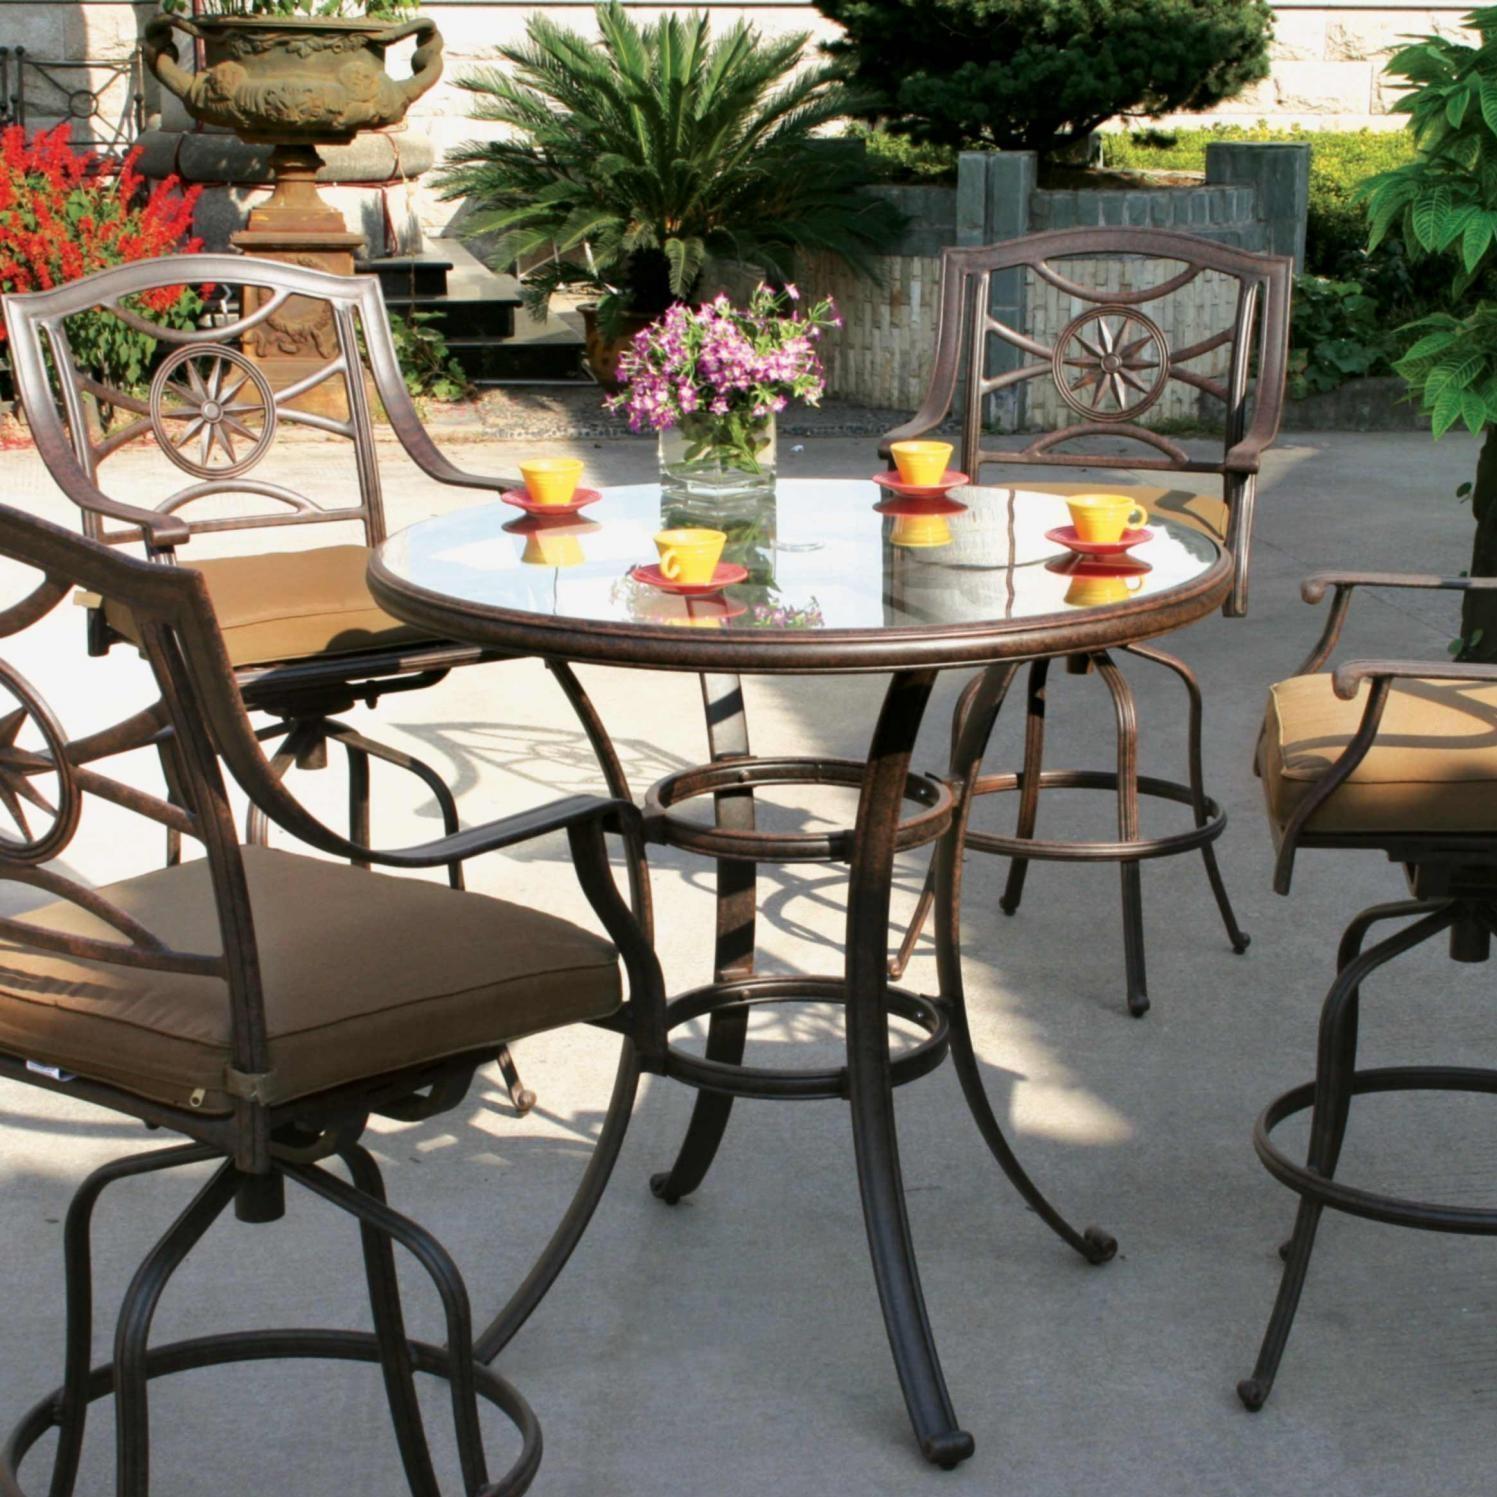 Cute Darlee Ten Star 4-Person Patio Bar Set - Antique Bronze. Darlee Ten Star 5 piece bar height patio set